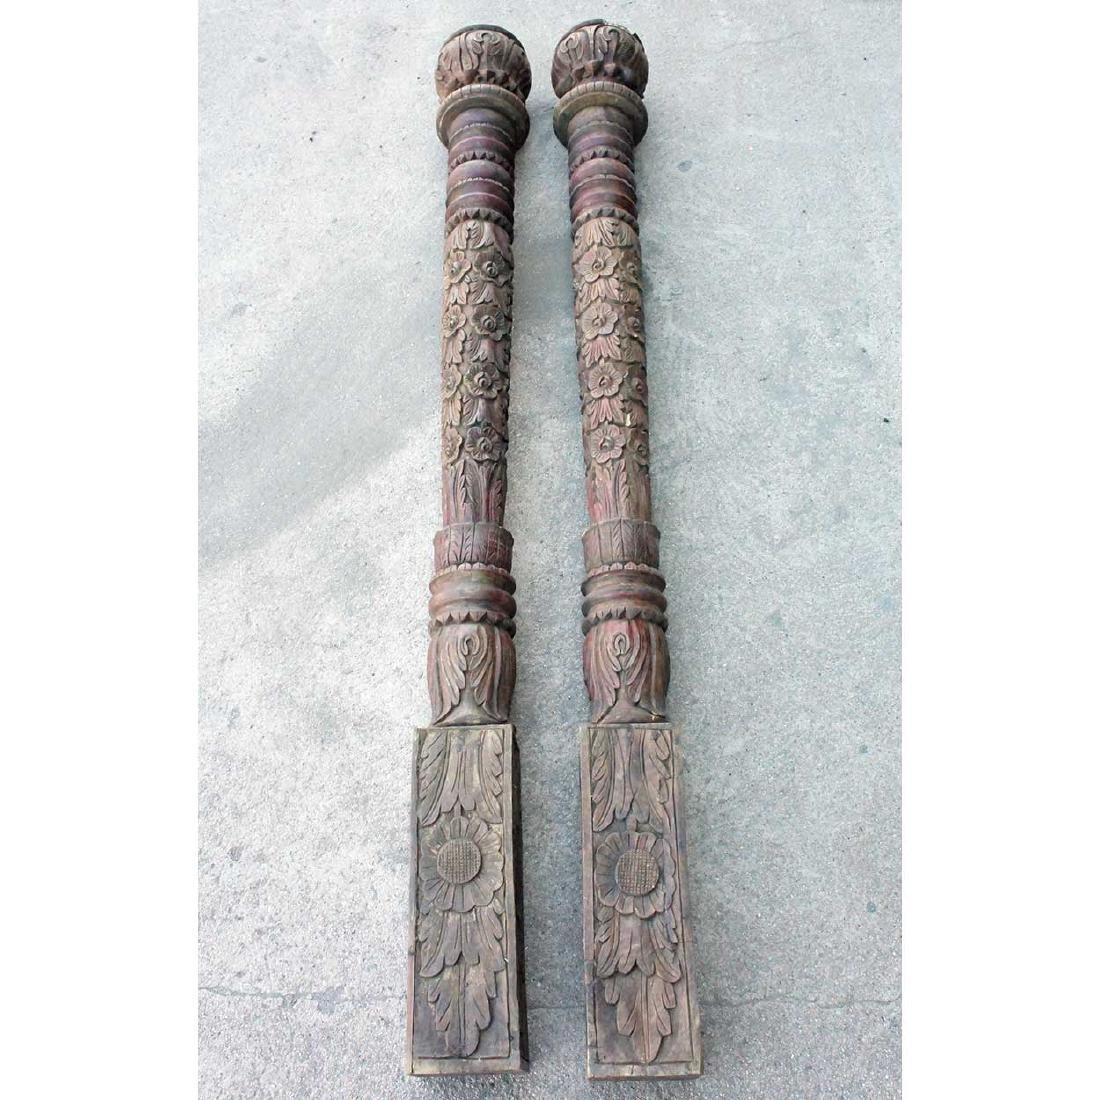 Pair of Reproduction Indian Teak Columns